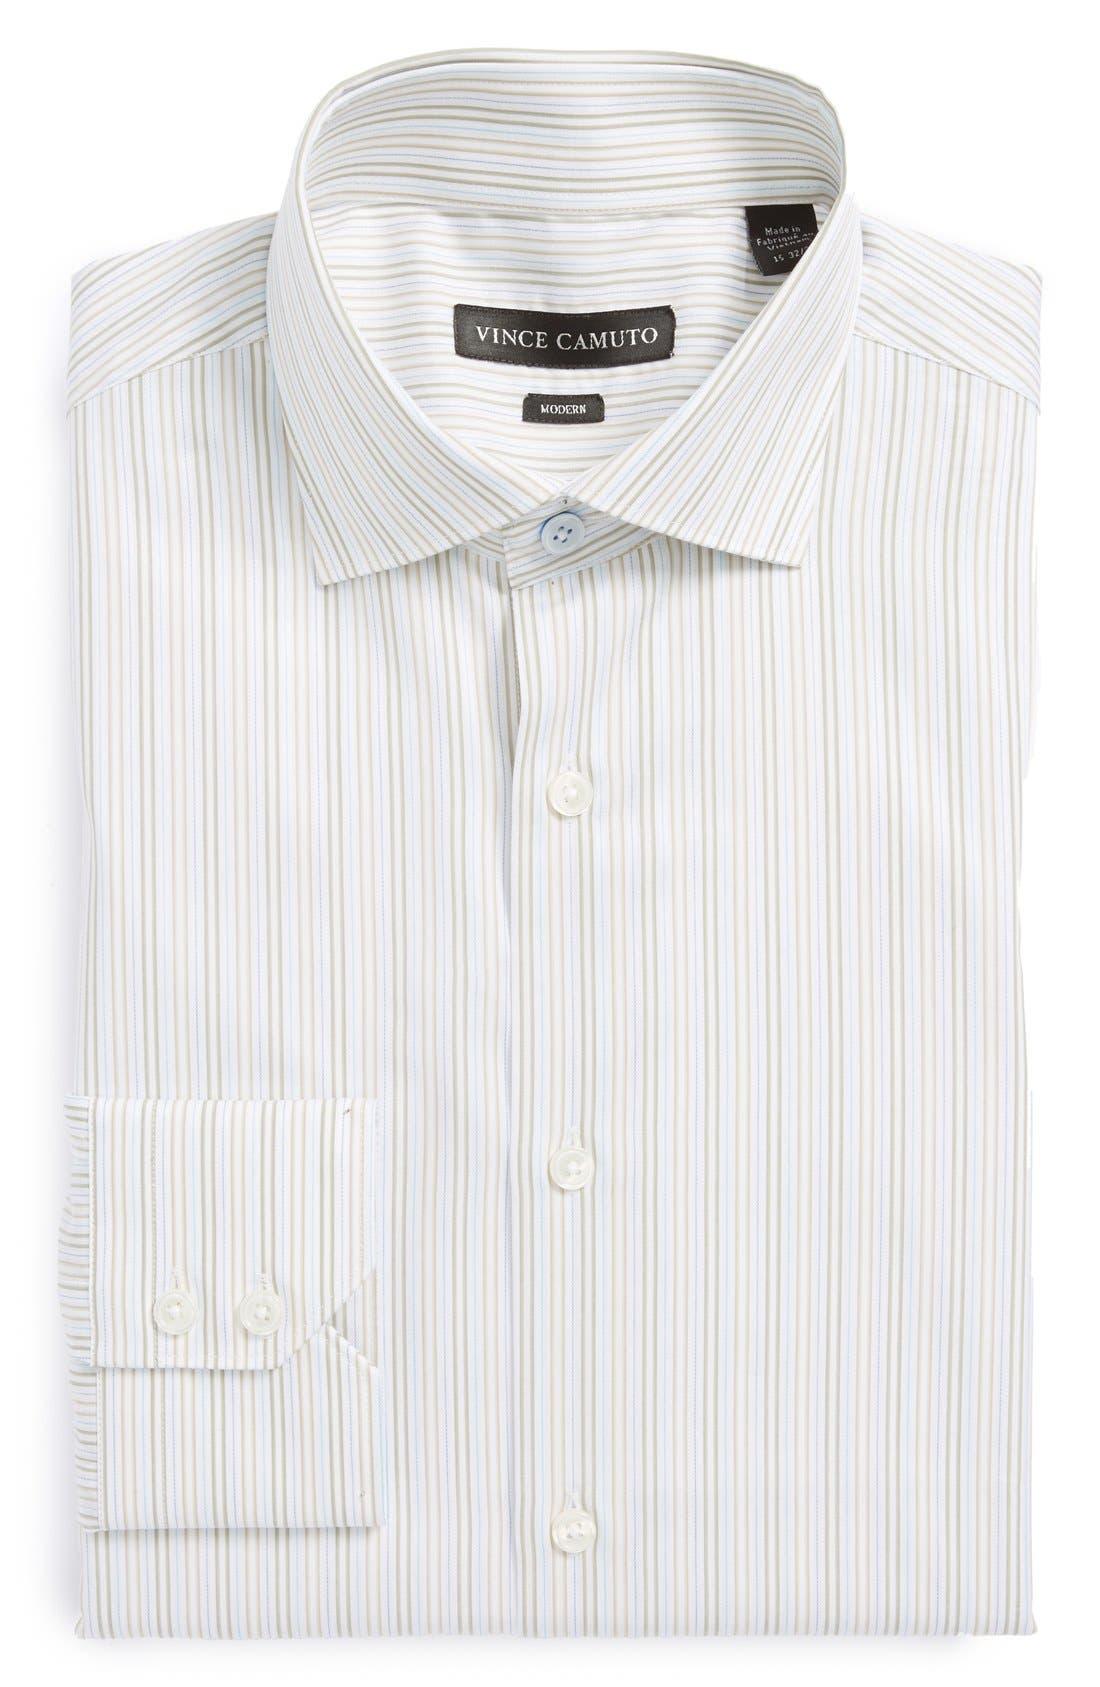 Alternate Image 1 Selected - Vince Camuto Modern Fit Stripe Dress Shirt